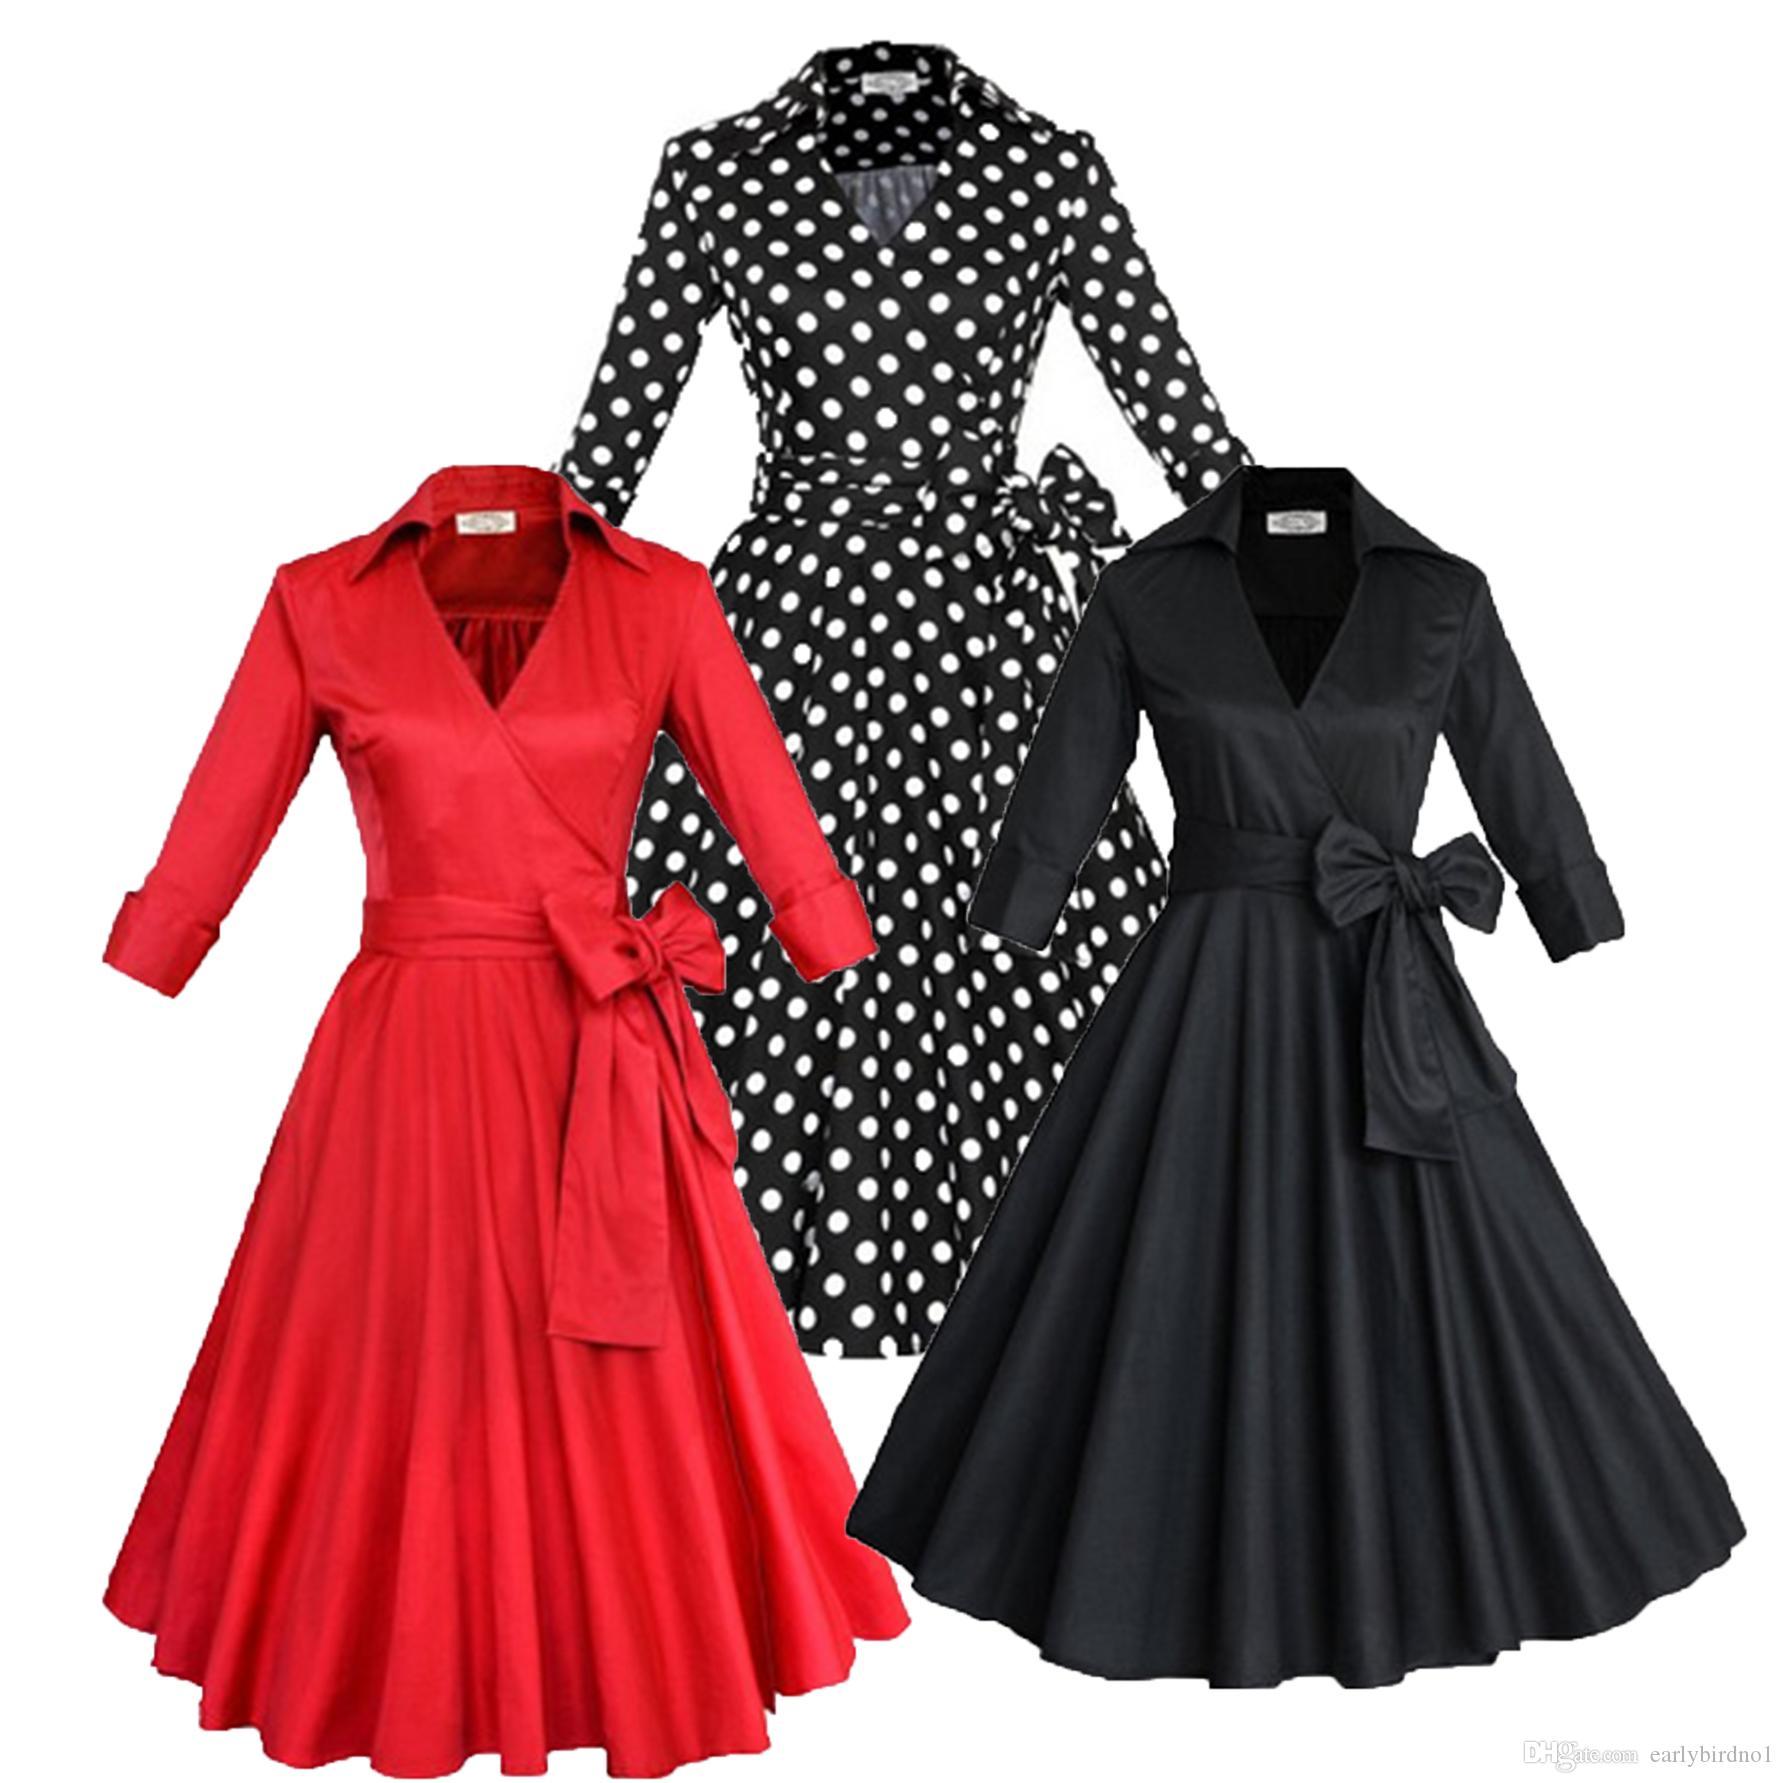 Fashion New Audrey Hepburn Vintage Style Casual